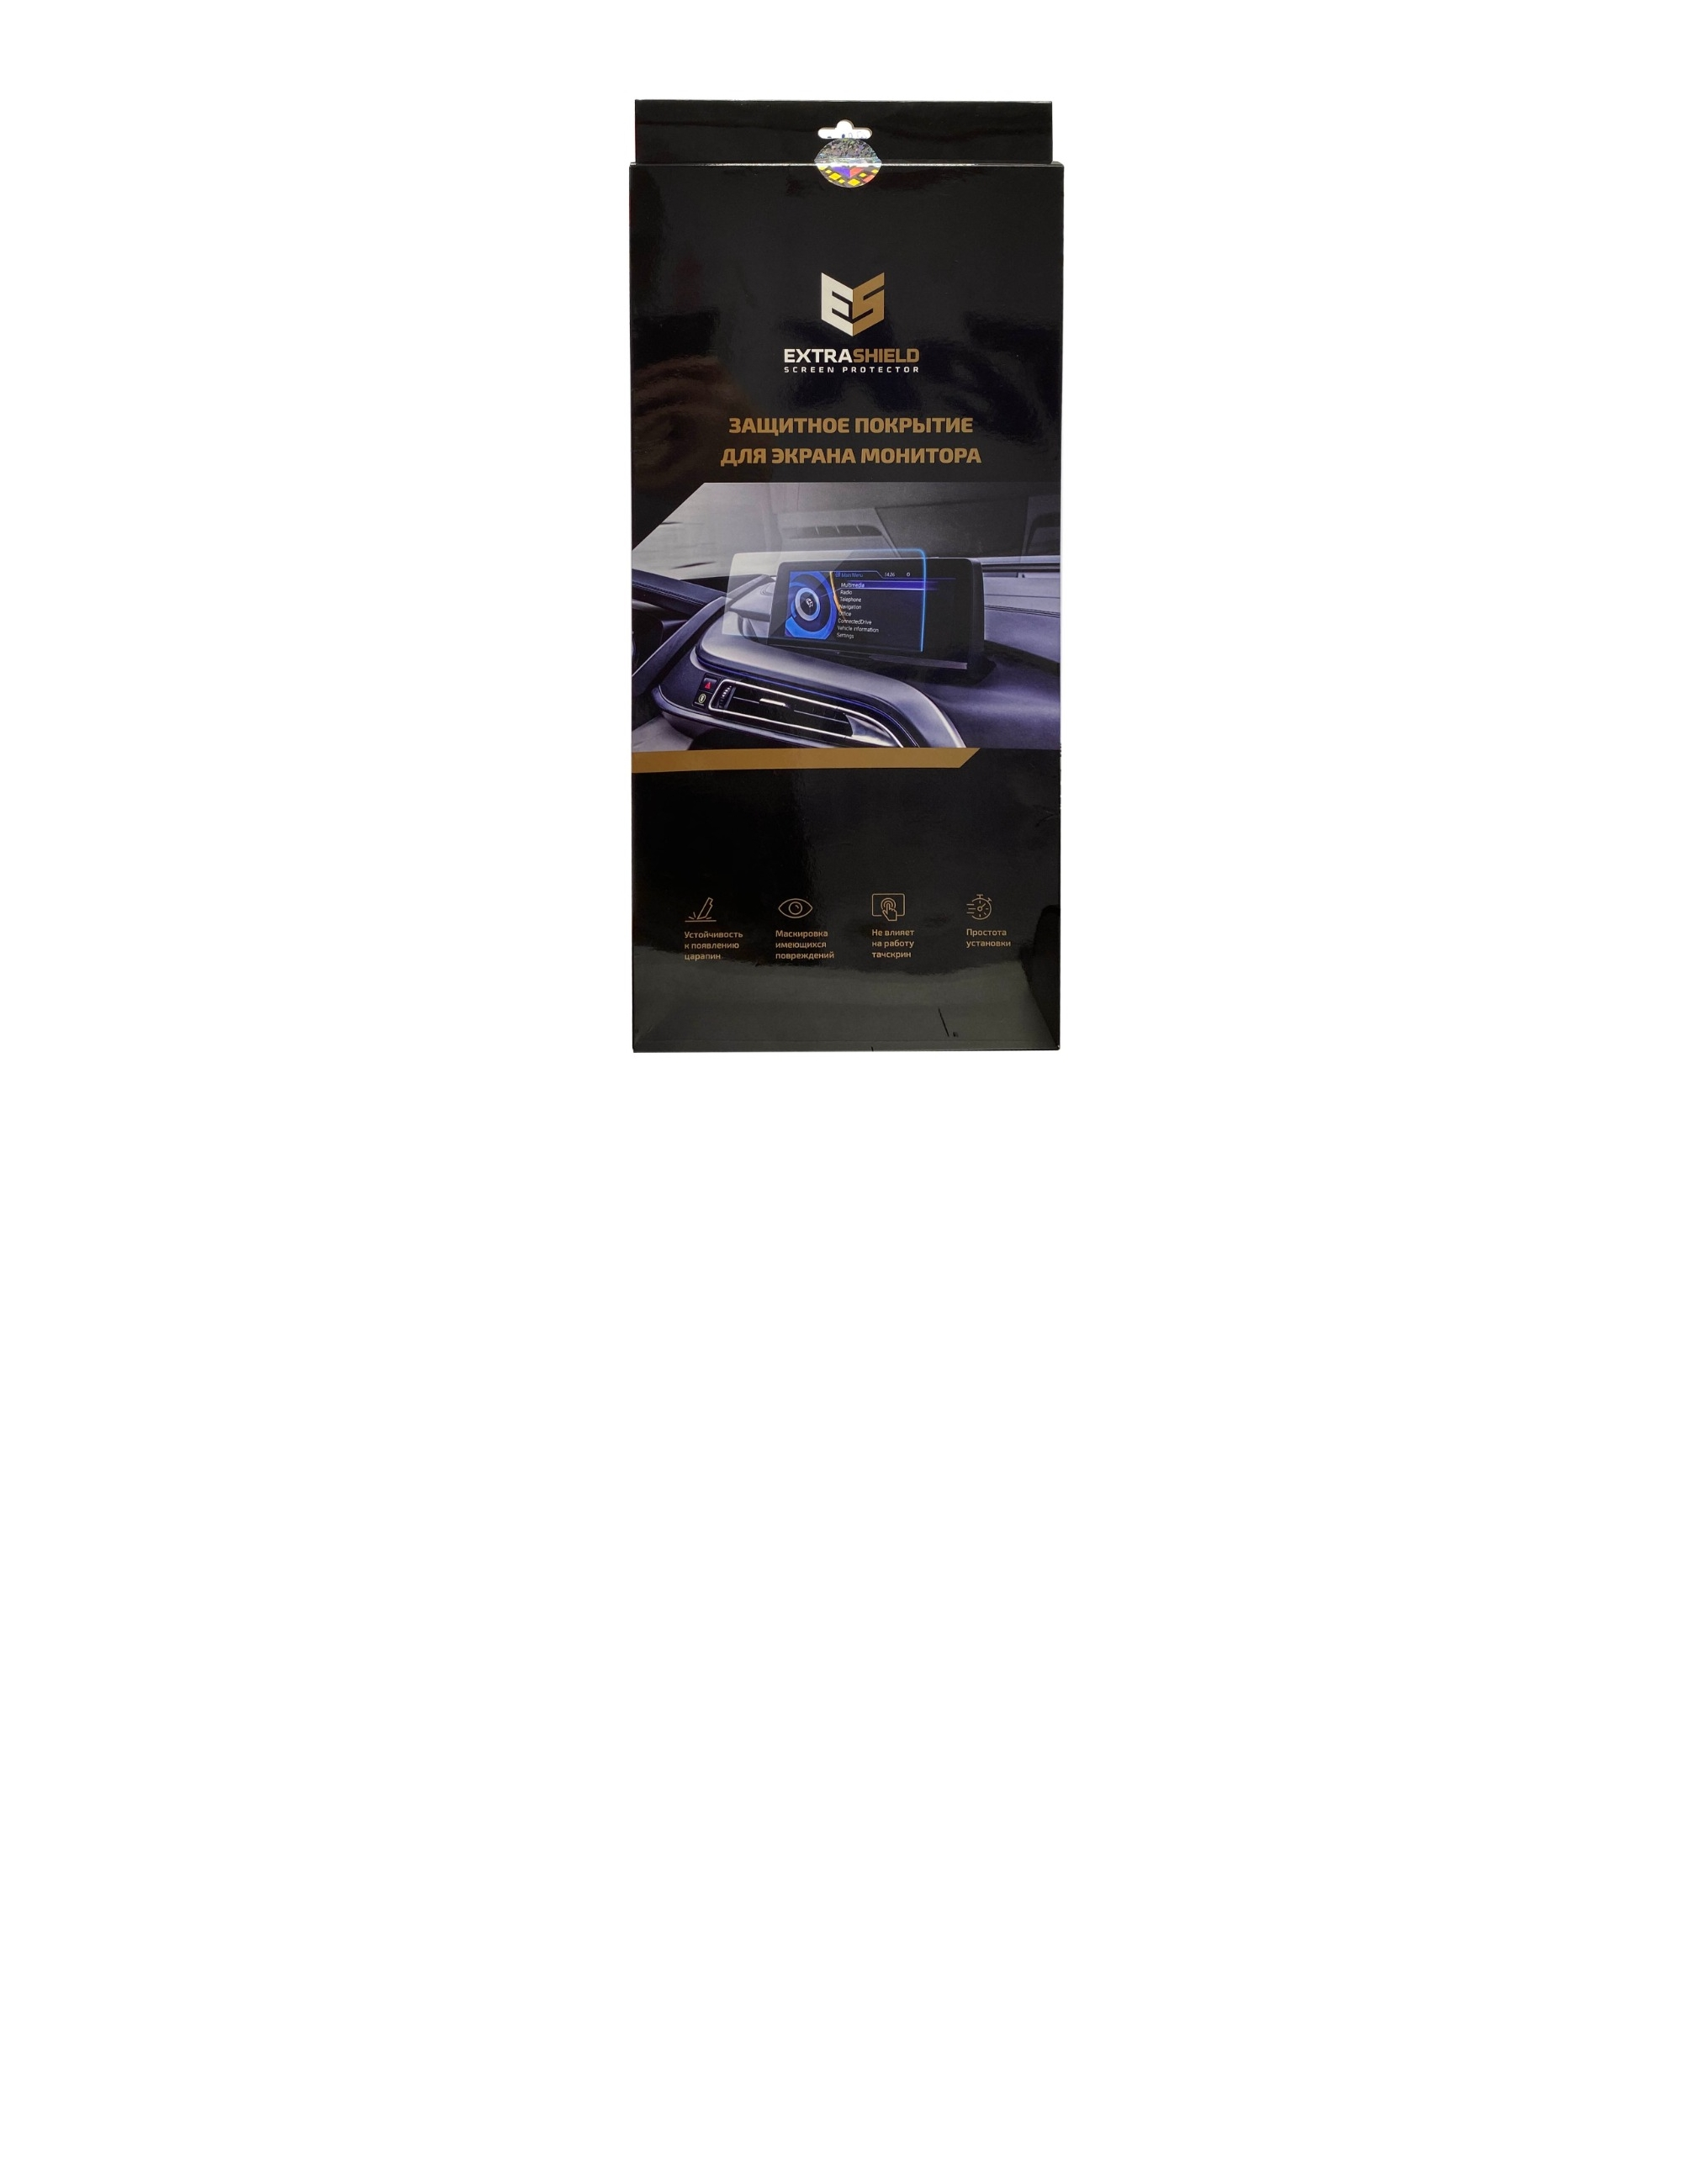 BMW X4 ( F26) 2014 - 2018 мультимедиа NBT 8.8 Защитное стекло Глянец